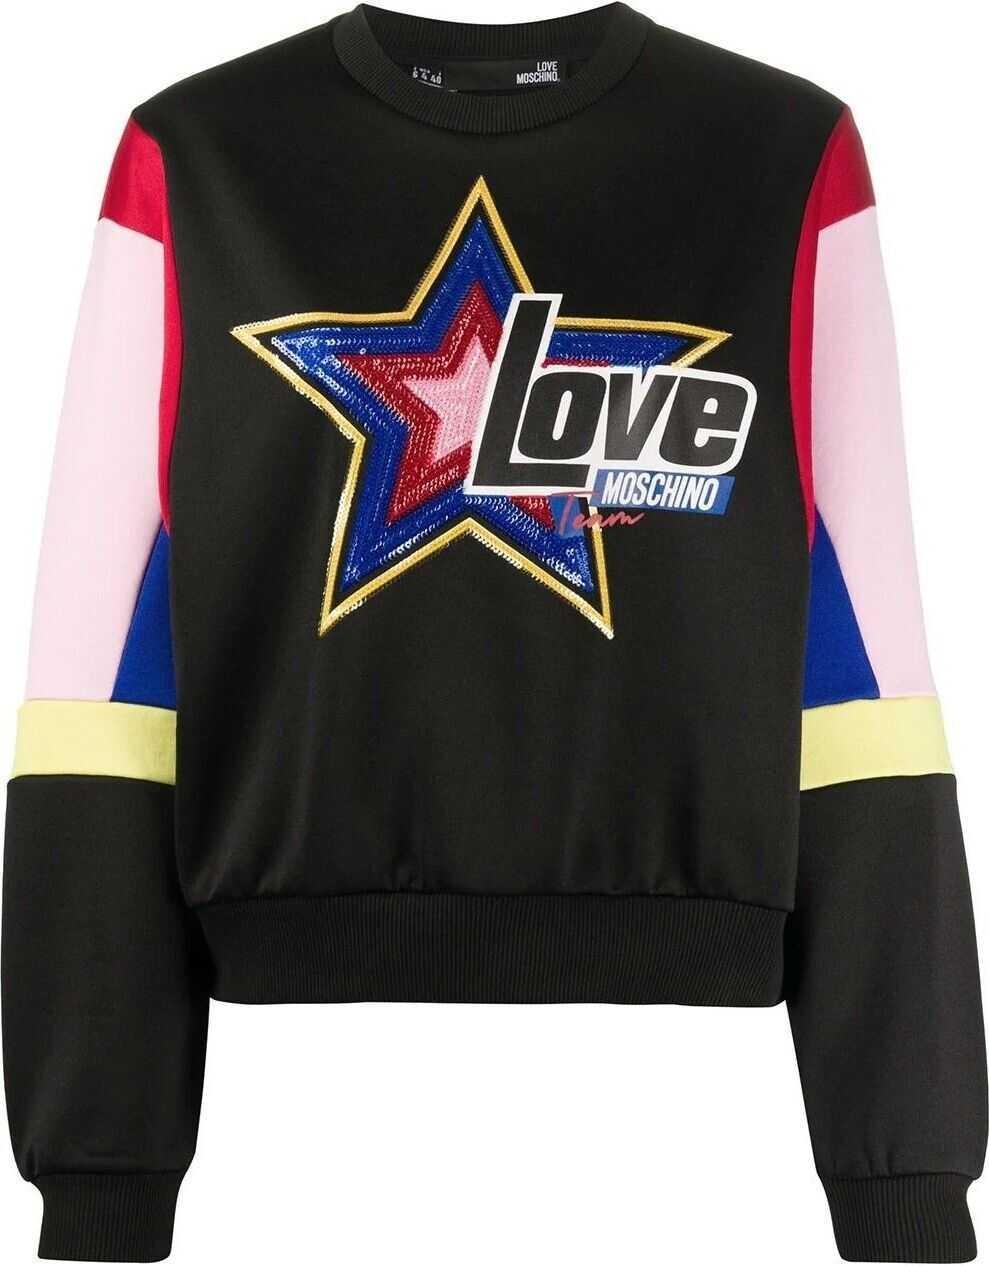 LOVE Moschino Cotton Sweatshirt BLACK